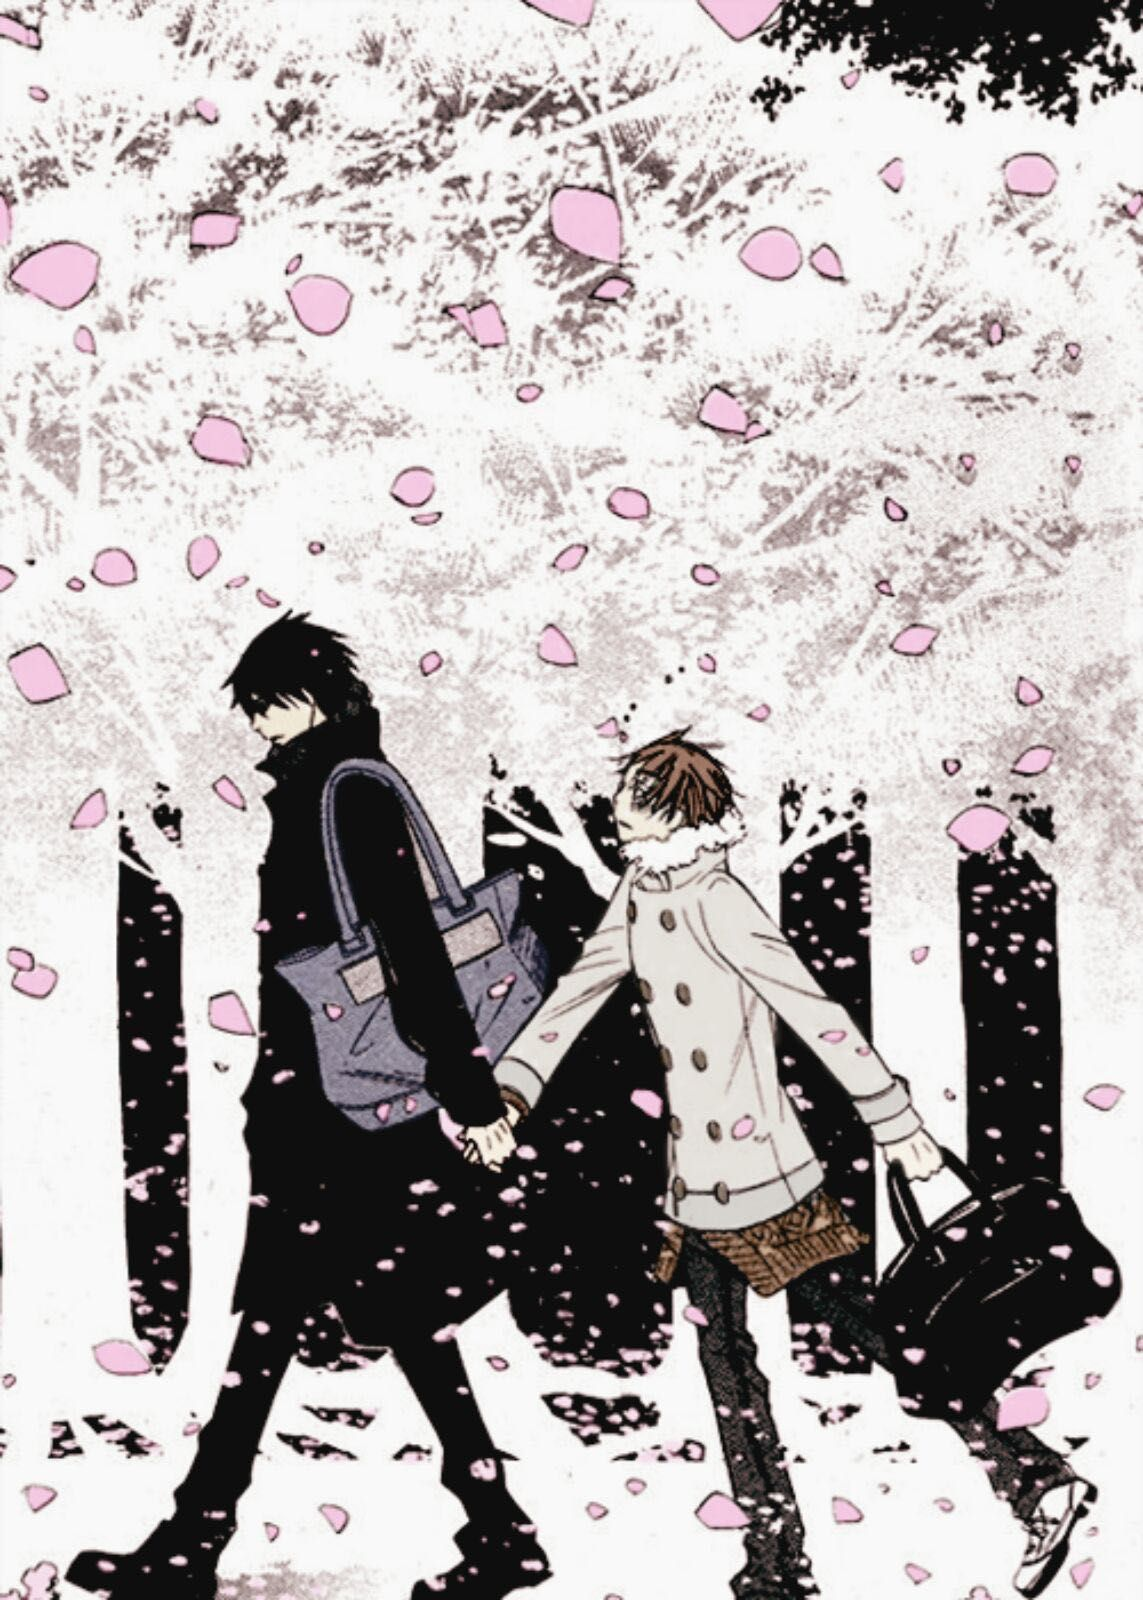 Junjou Romantica + Sekai Ichi Hatsukoi Truth or Dare ...